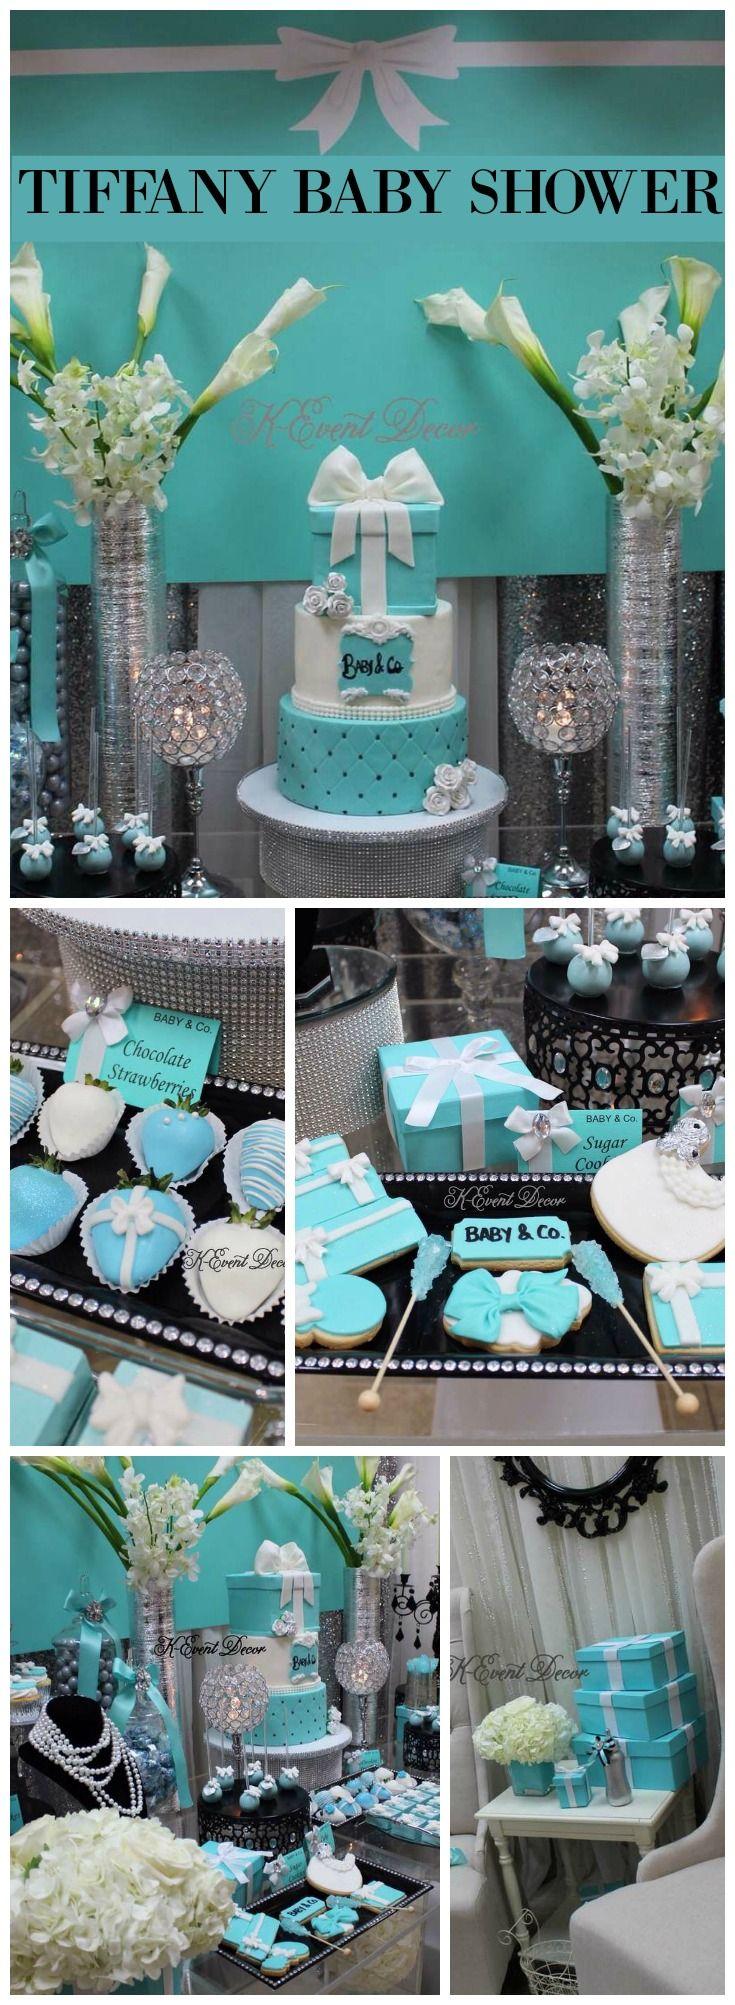 Tiffany S Baby Shower Baby Co In 2019 Tiffany S Party Ideas